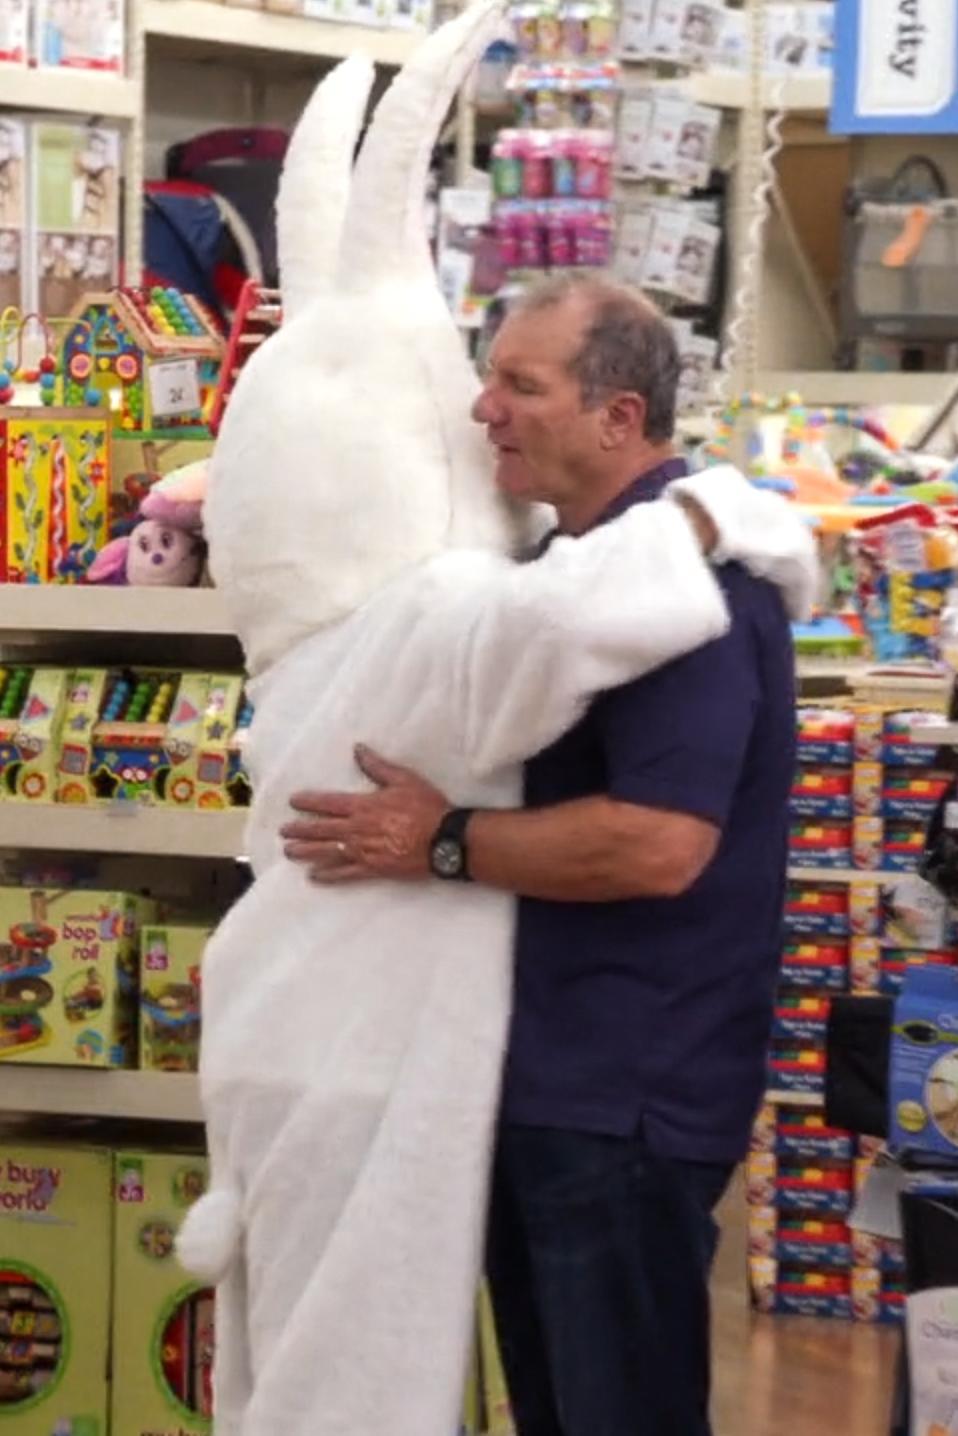 Hug-a-Bunny